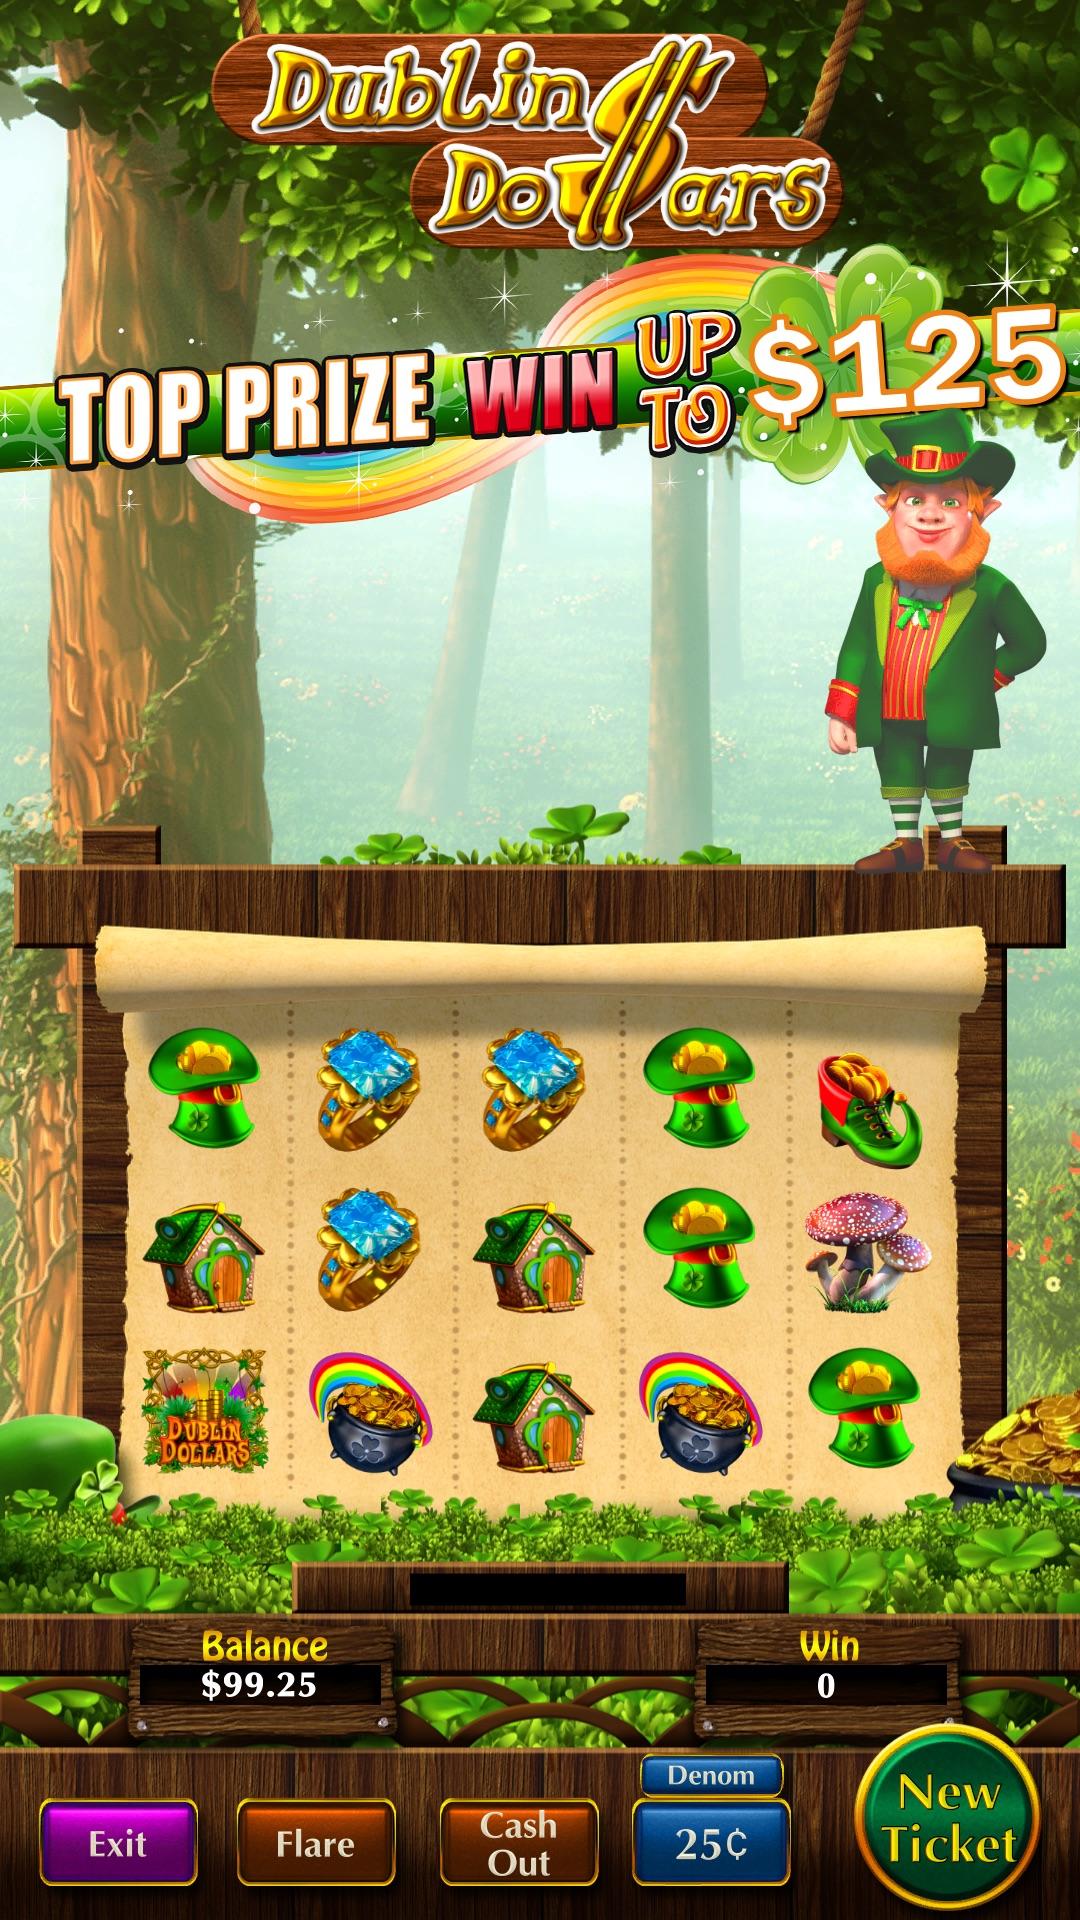 Dublin-dollars-vertical-pull-tab-main-game-screen